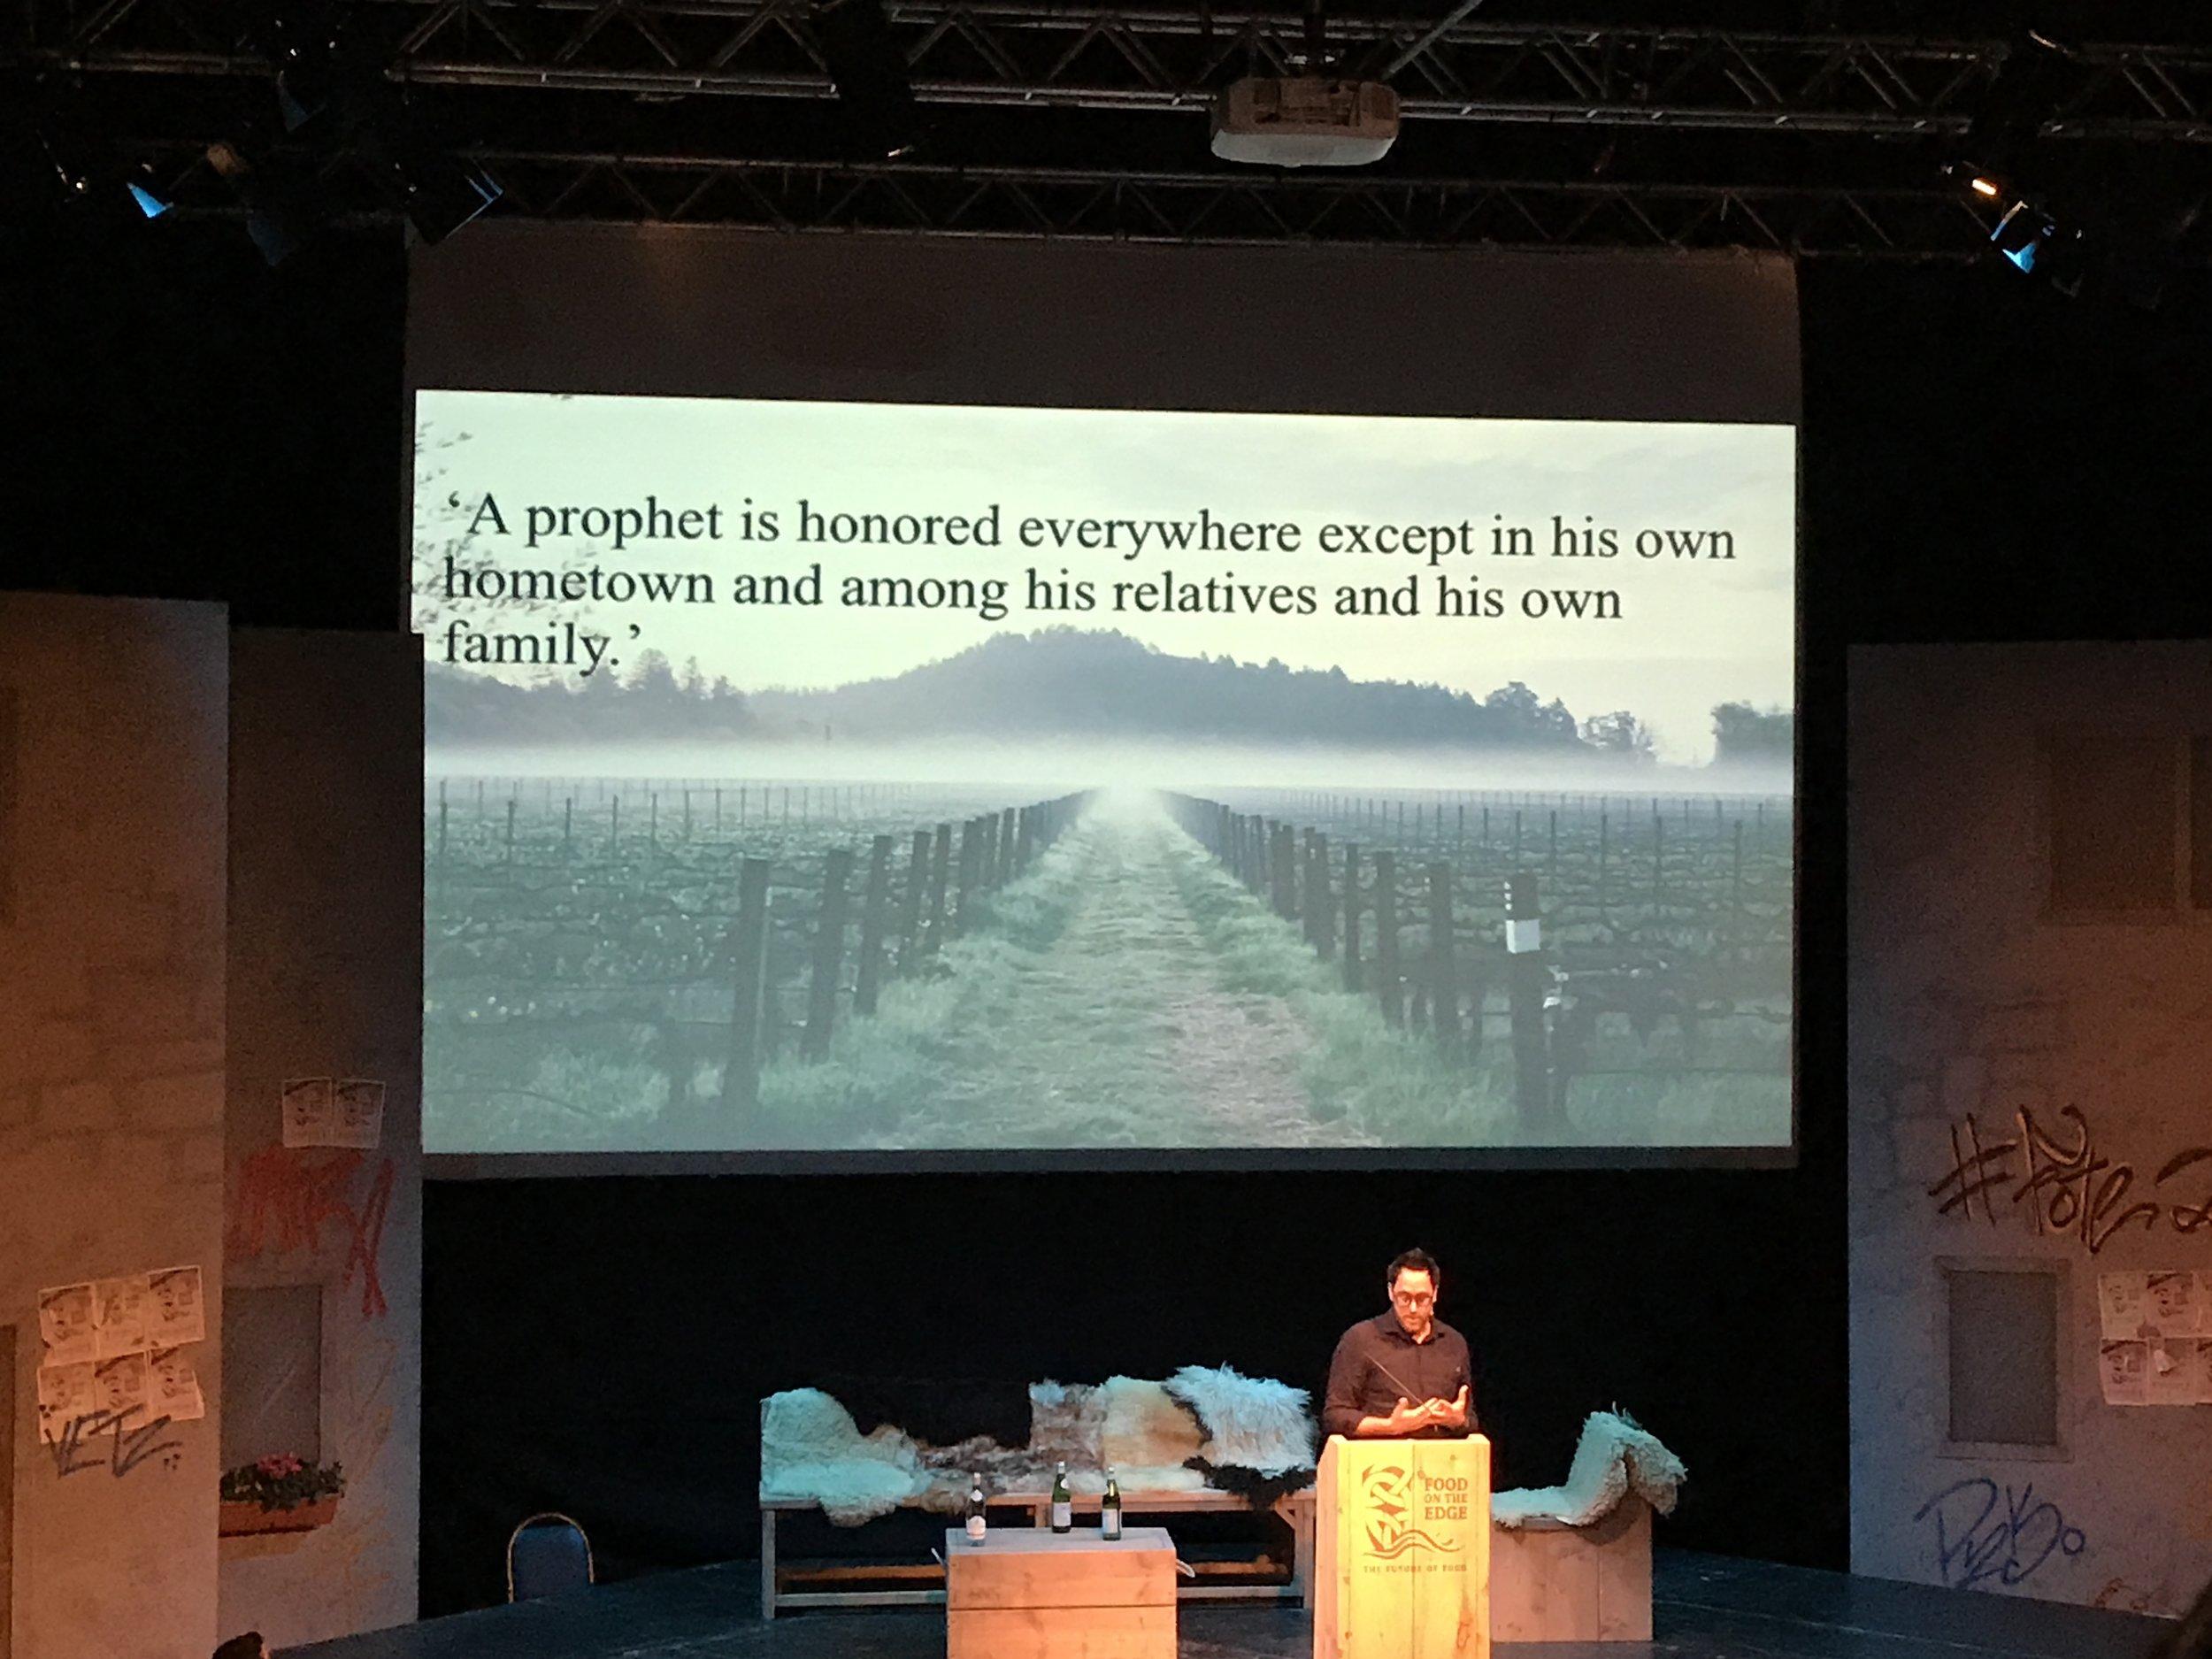 A prophet quote